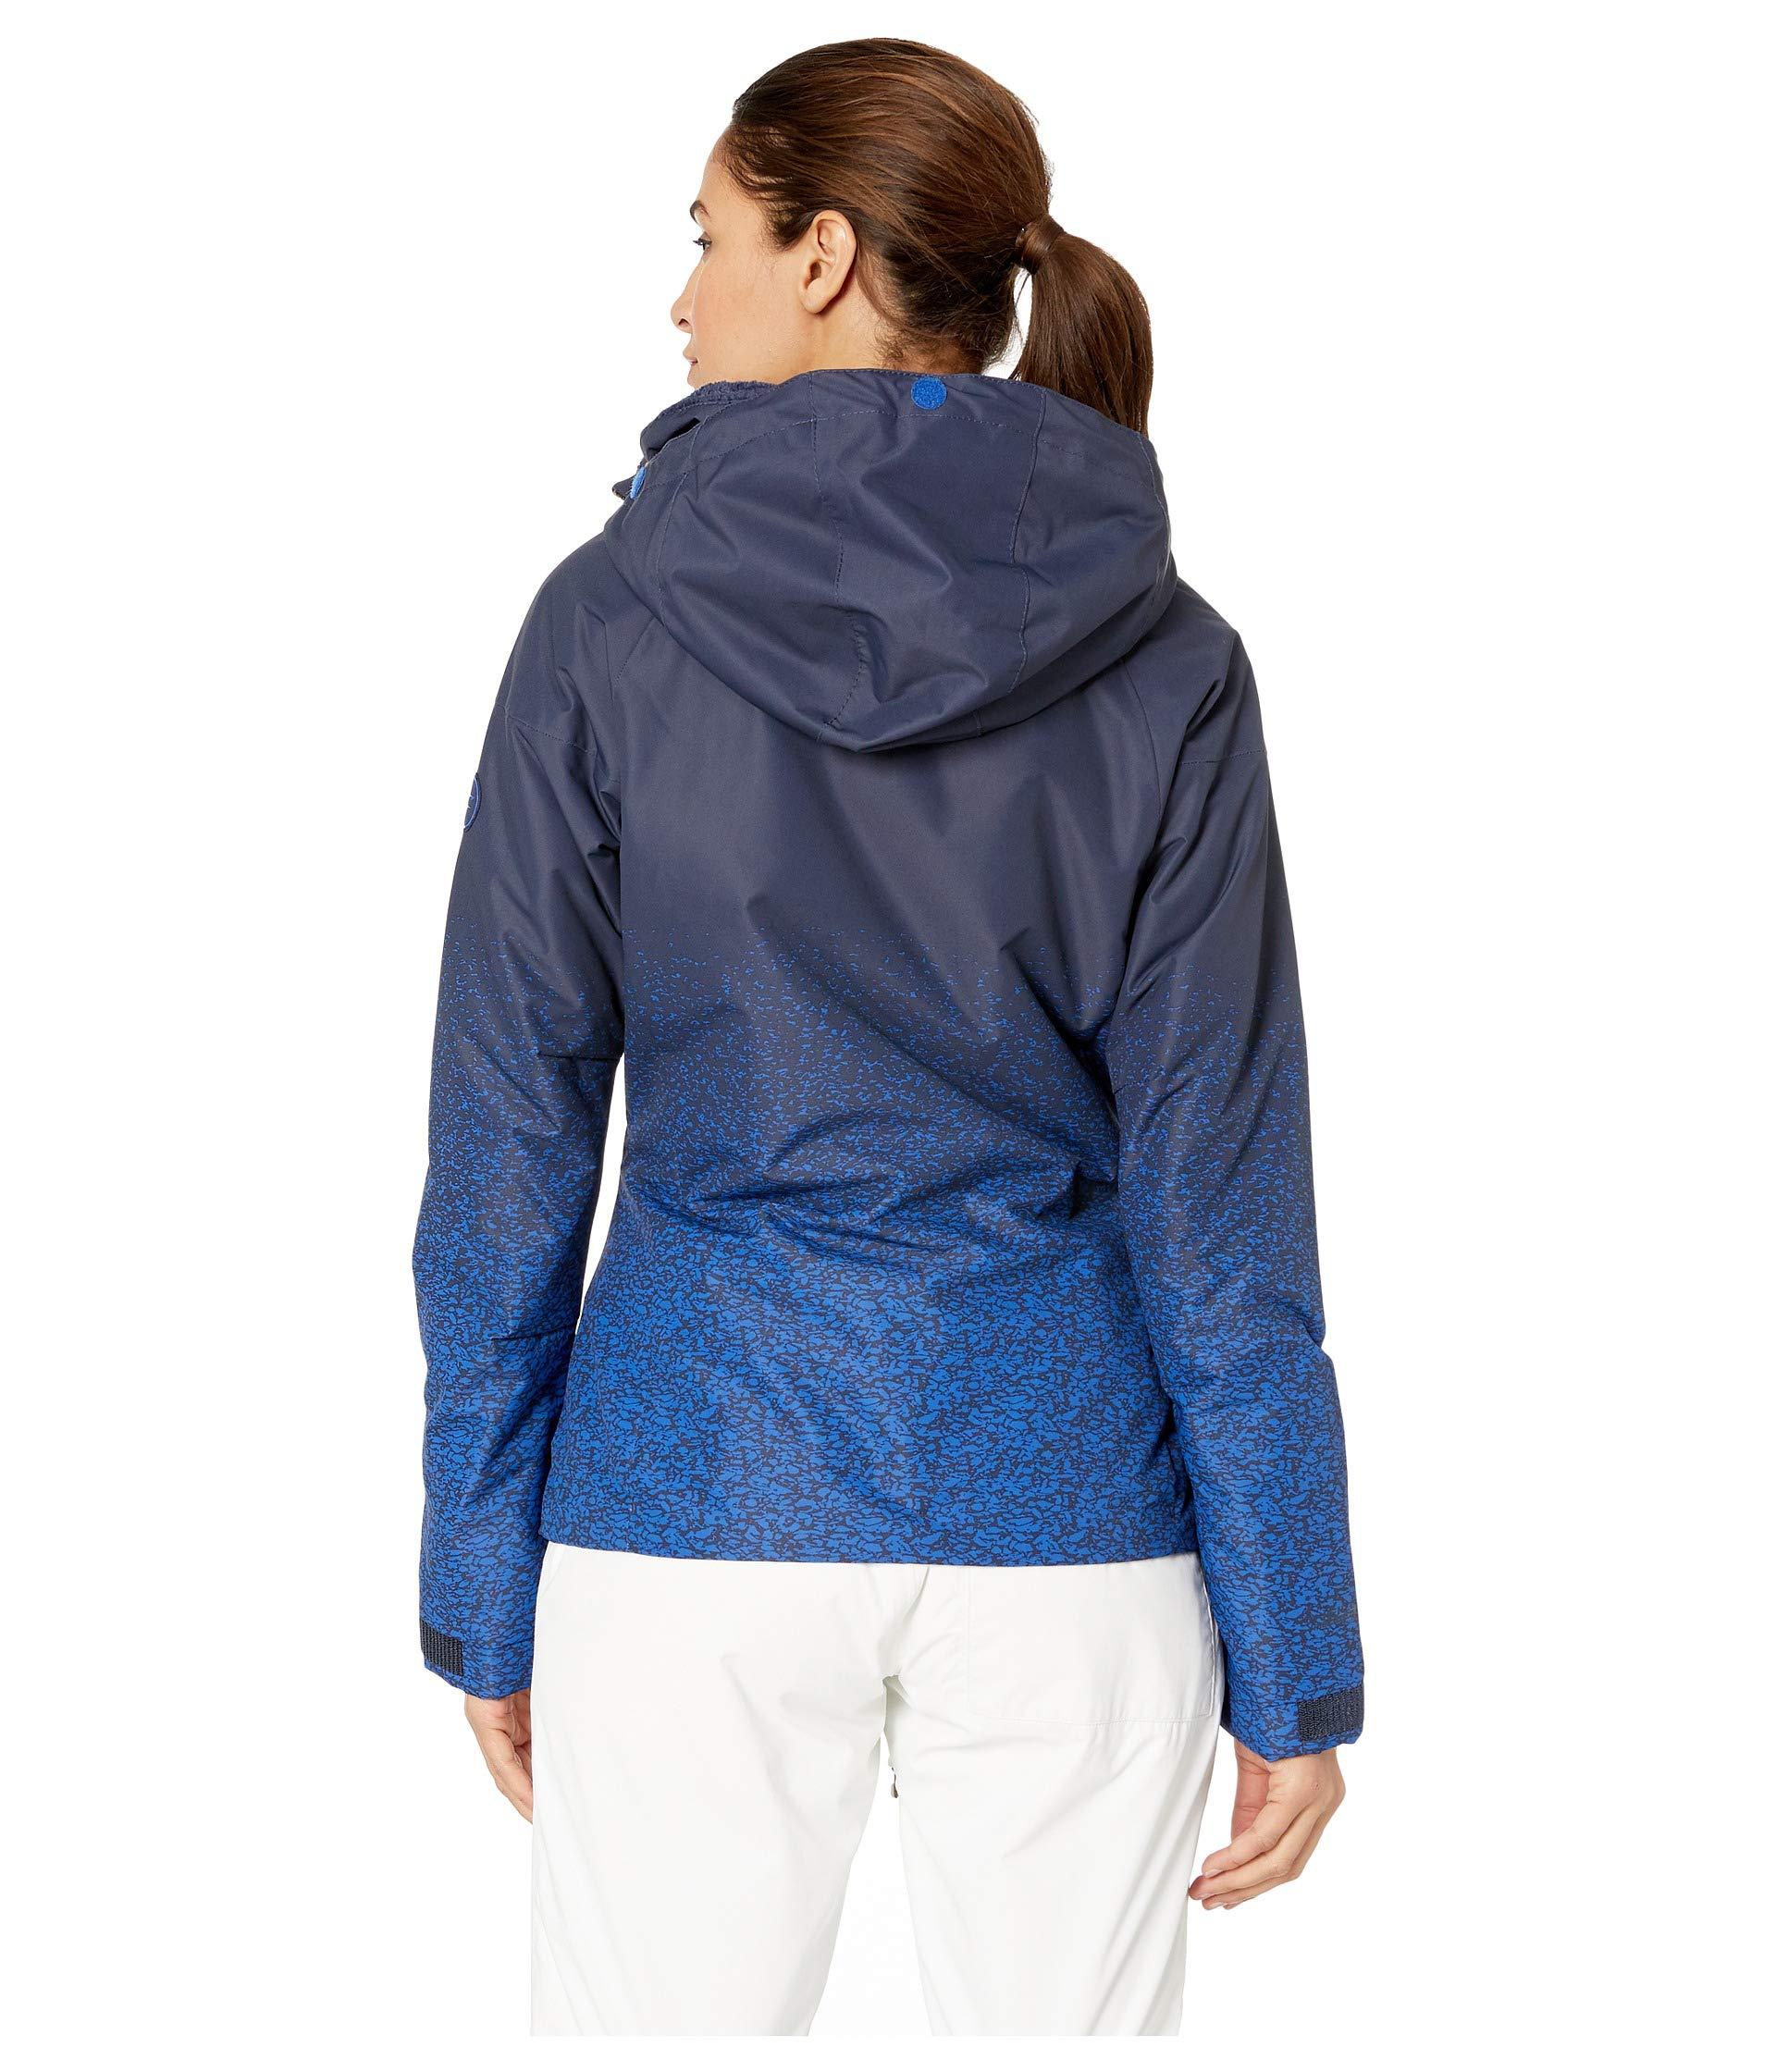 Curve O'neill Jacket Blue blue Aop UC7wqxwBd